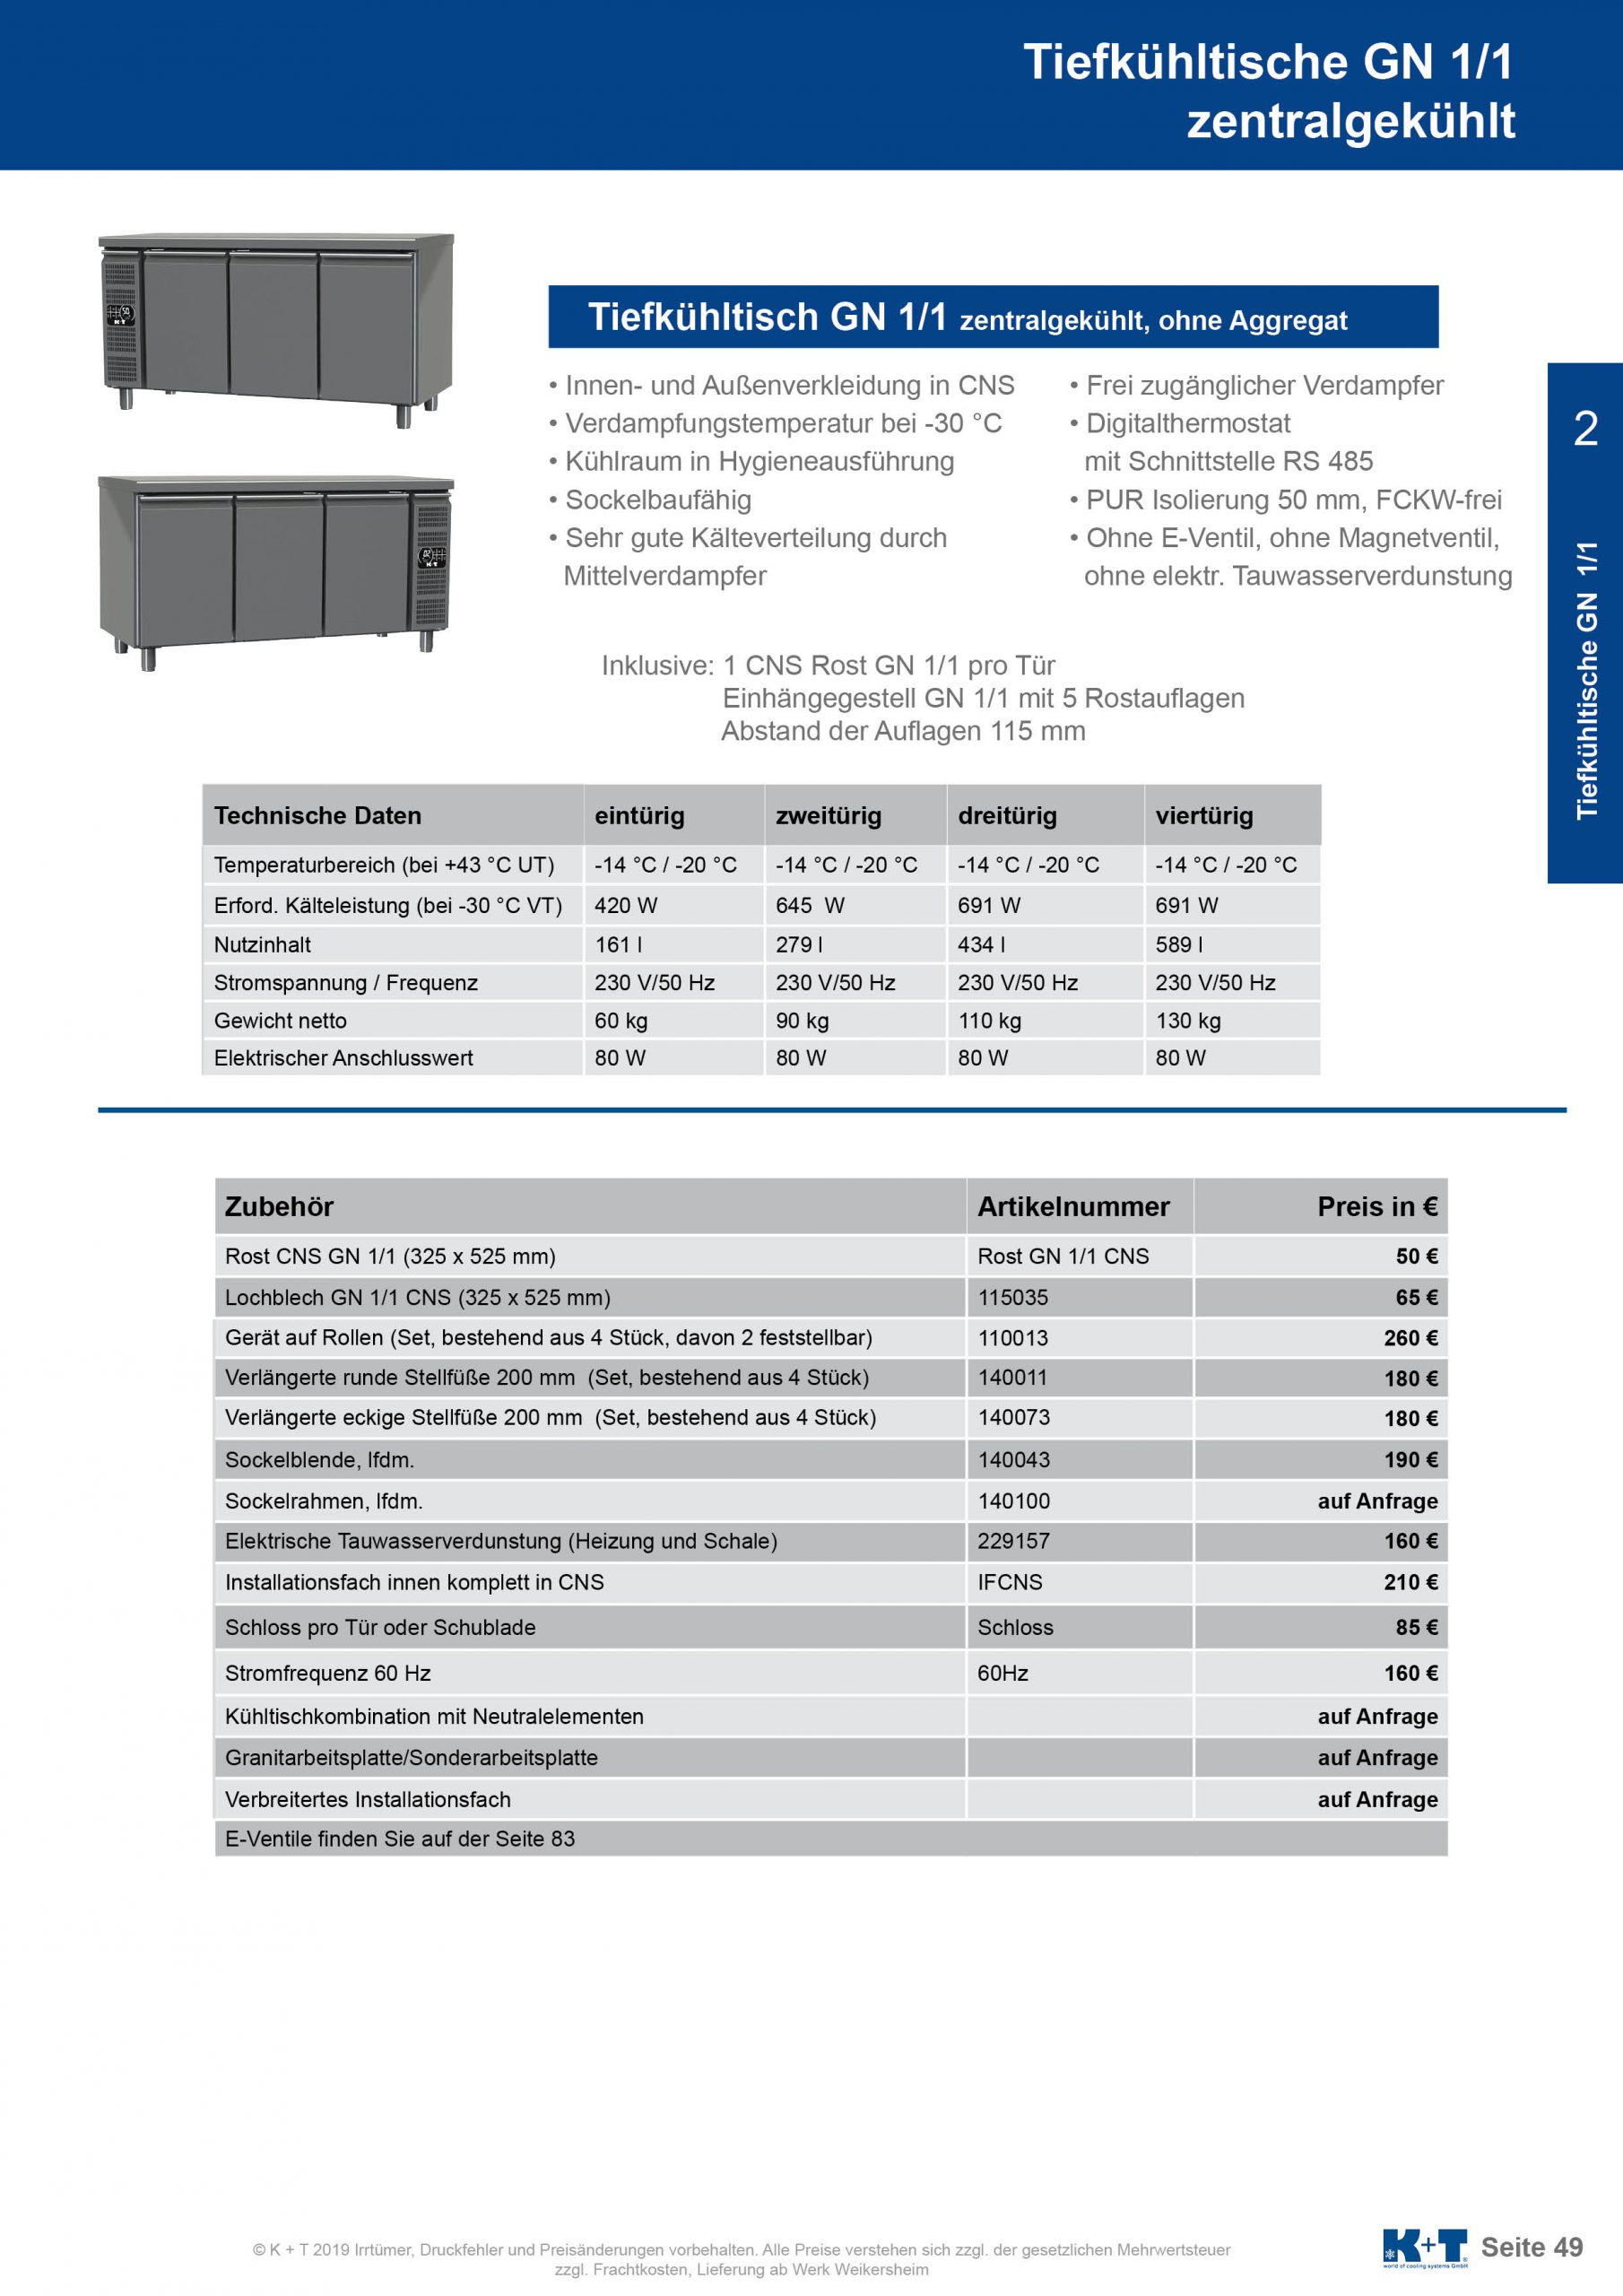 Tiefkühltisch GN 1_1 Korpus 700 zentralgekühlt 2